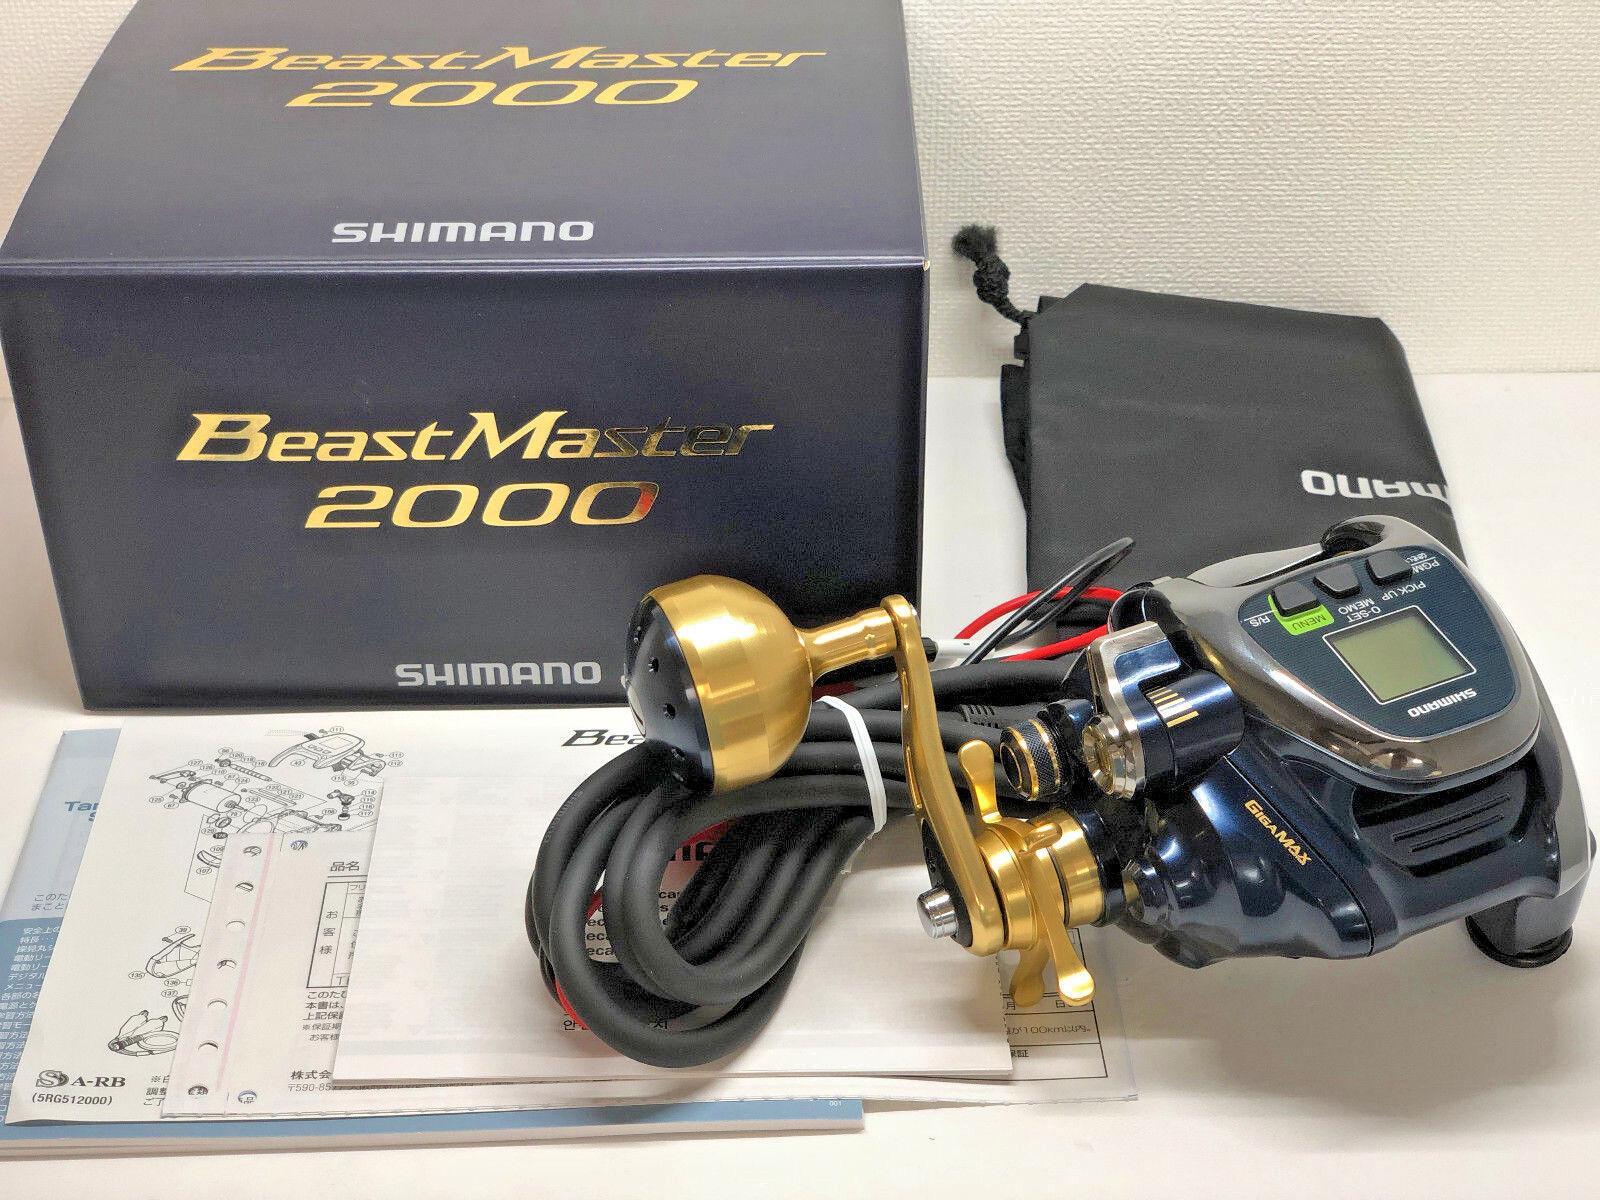 SHIMANO 18 BEAST MASTER 2000  - Free Shipping from Japan